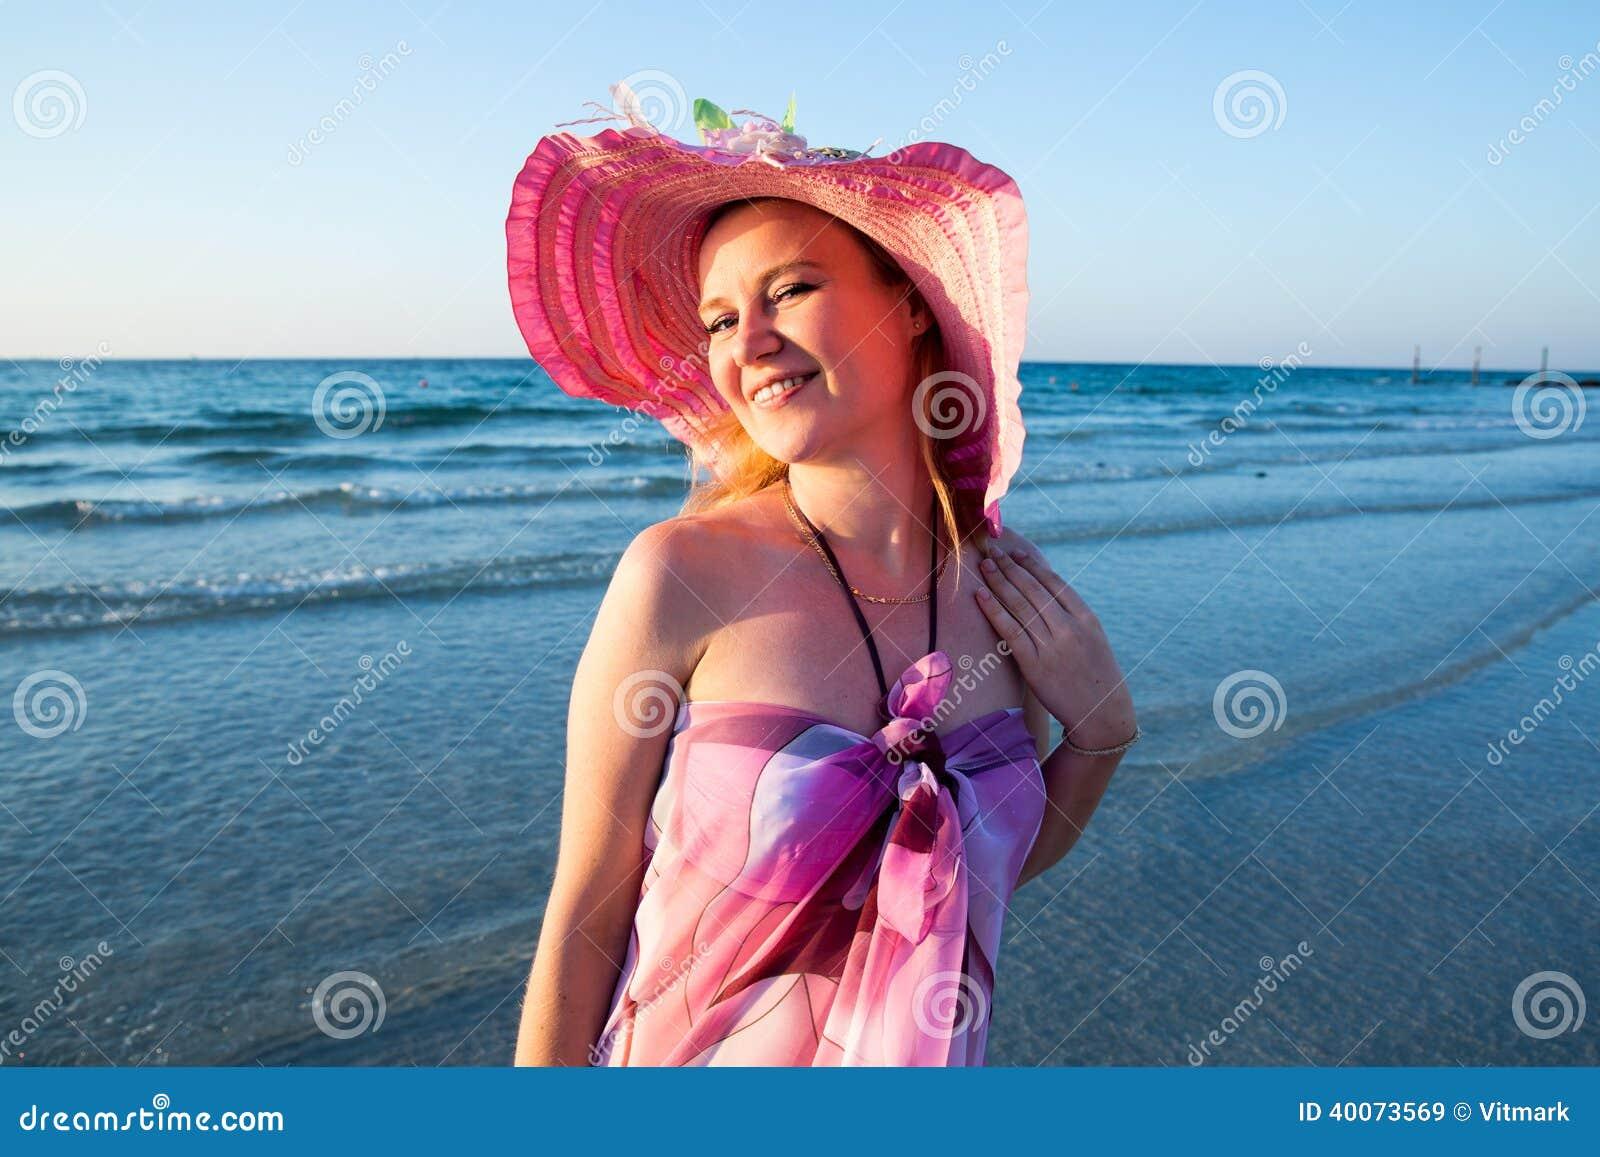 dubai beautiful nude women